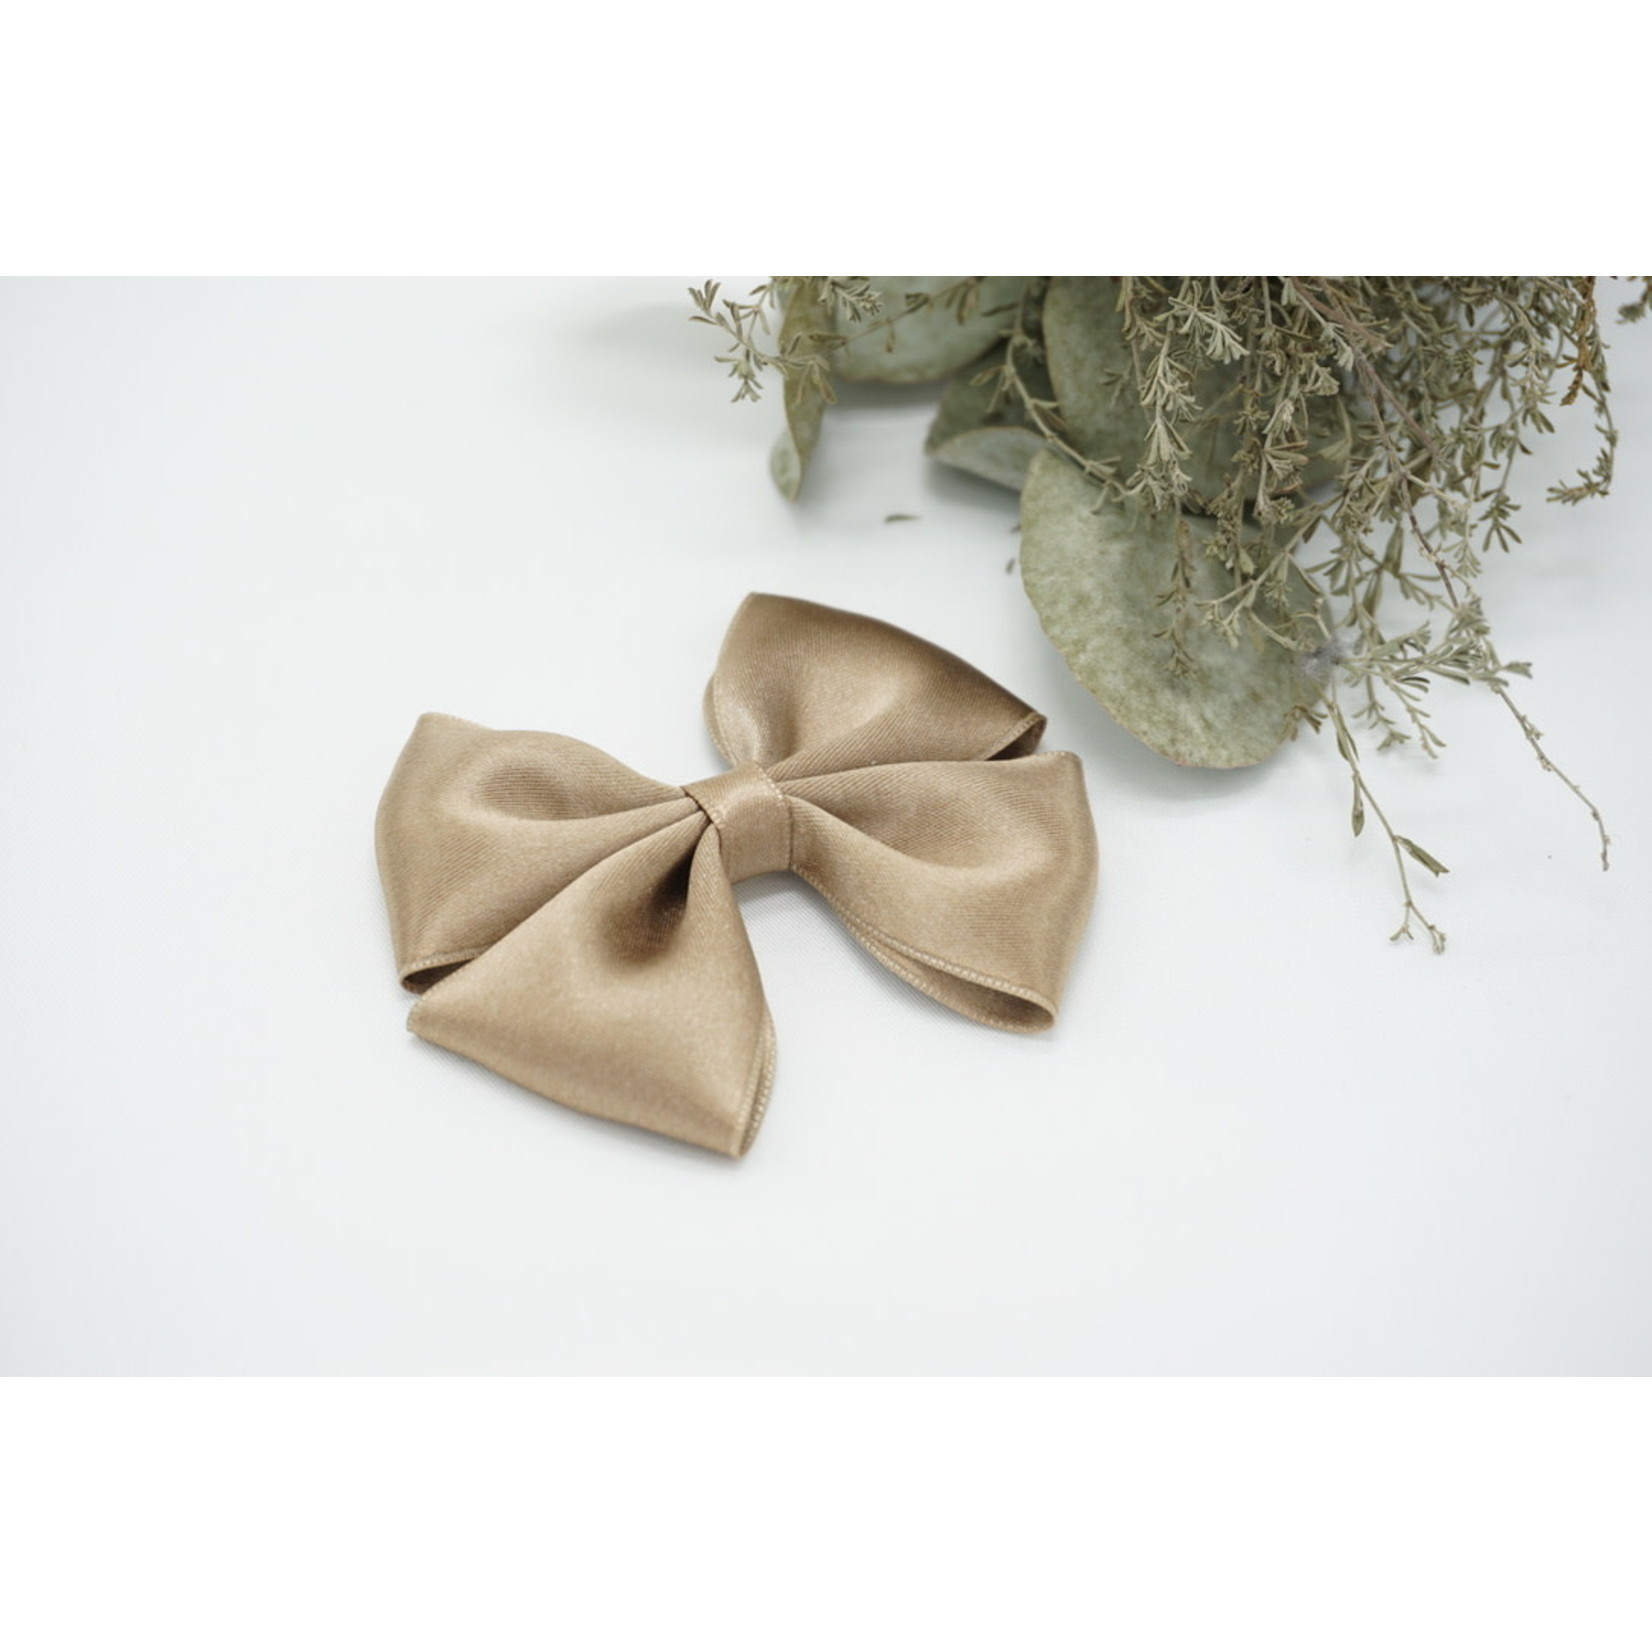 Petite Zara Satin Bow - Sienna